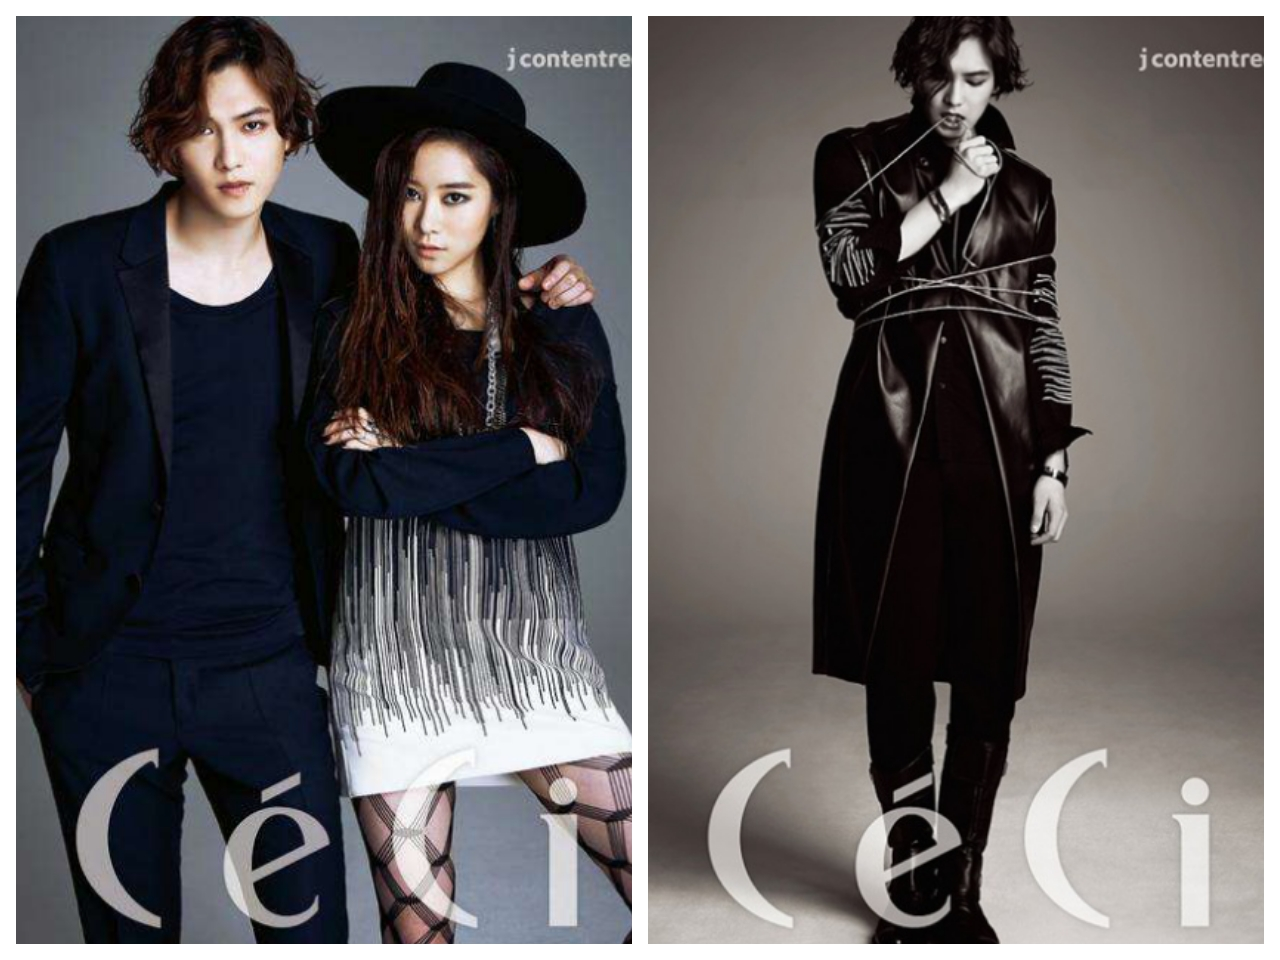 Lee Jong Hyun - Melody Day Cha Hee -  Ceci Sept